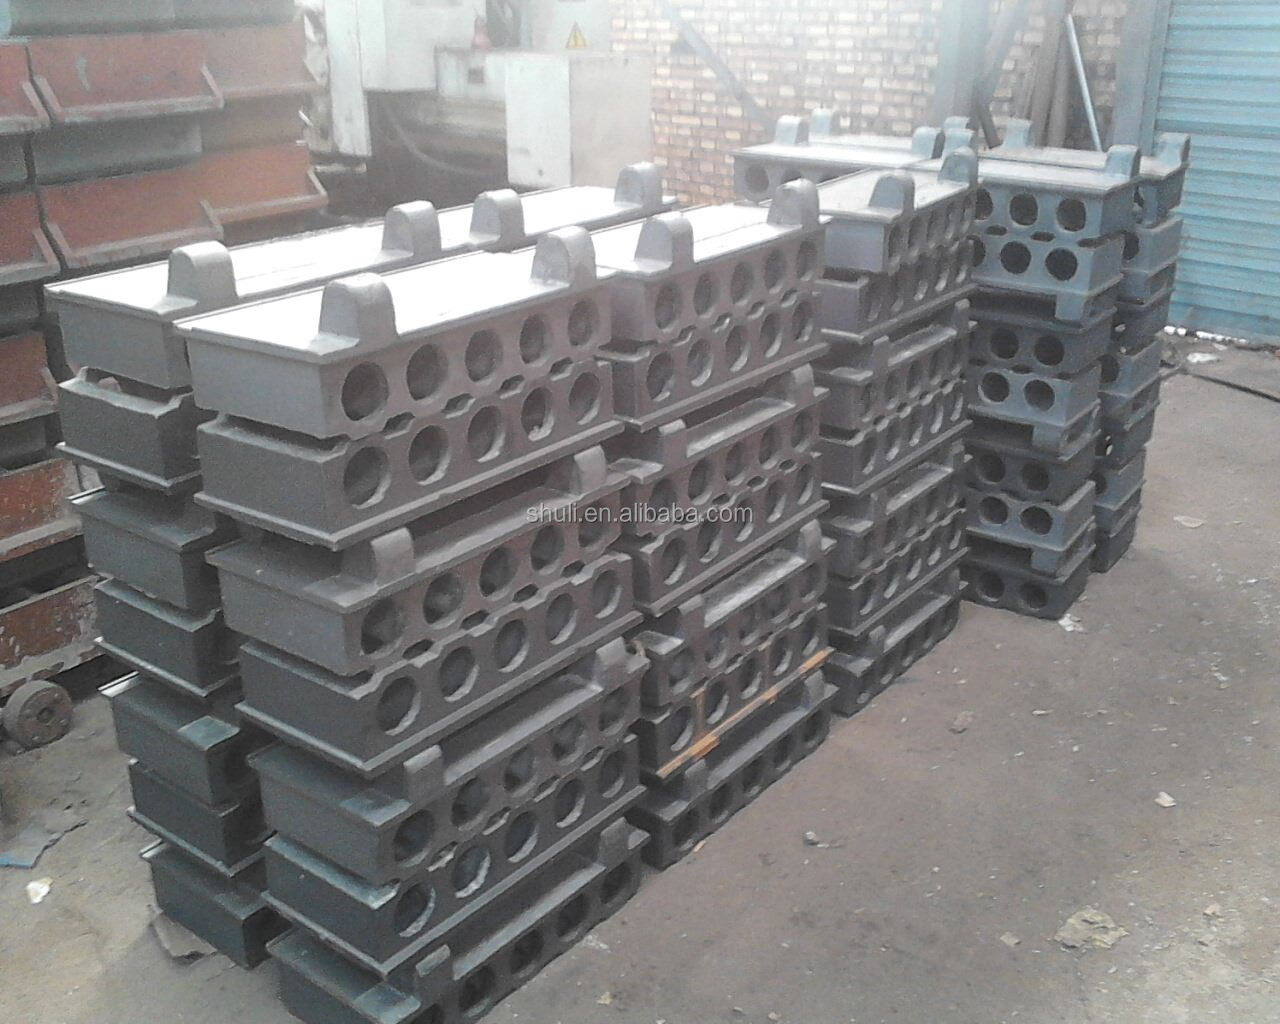 Precast Concrete Wall Panels Attachment : Concrete floor slab making machine precast wall